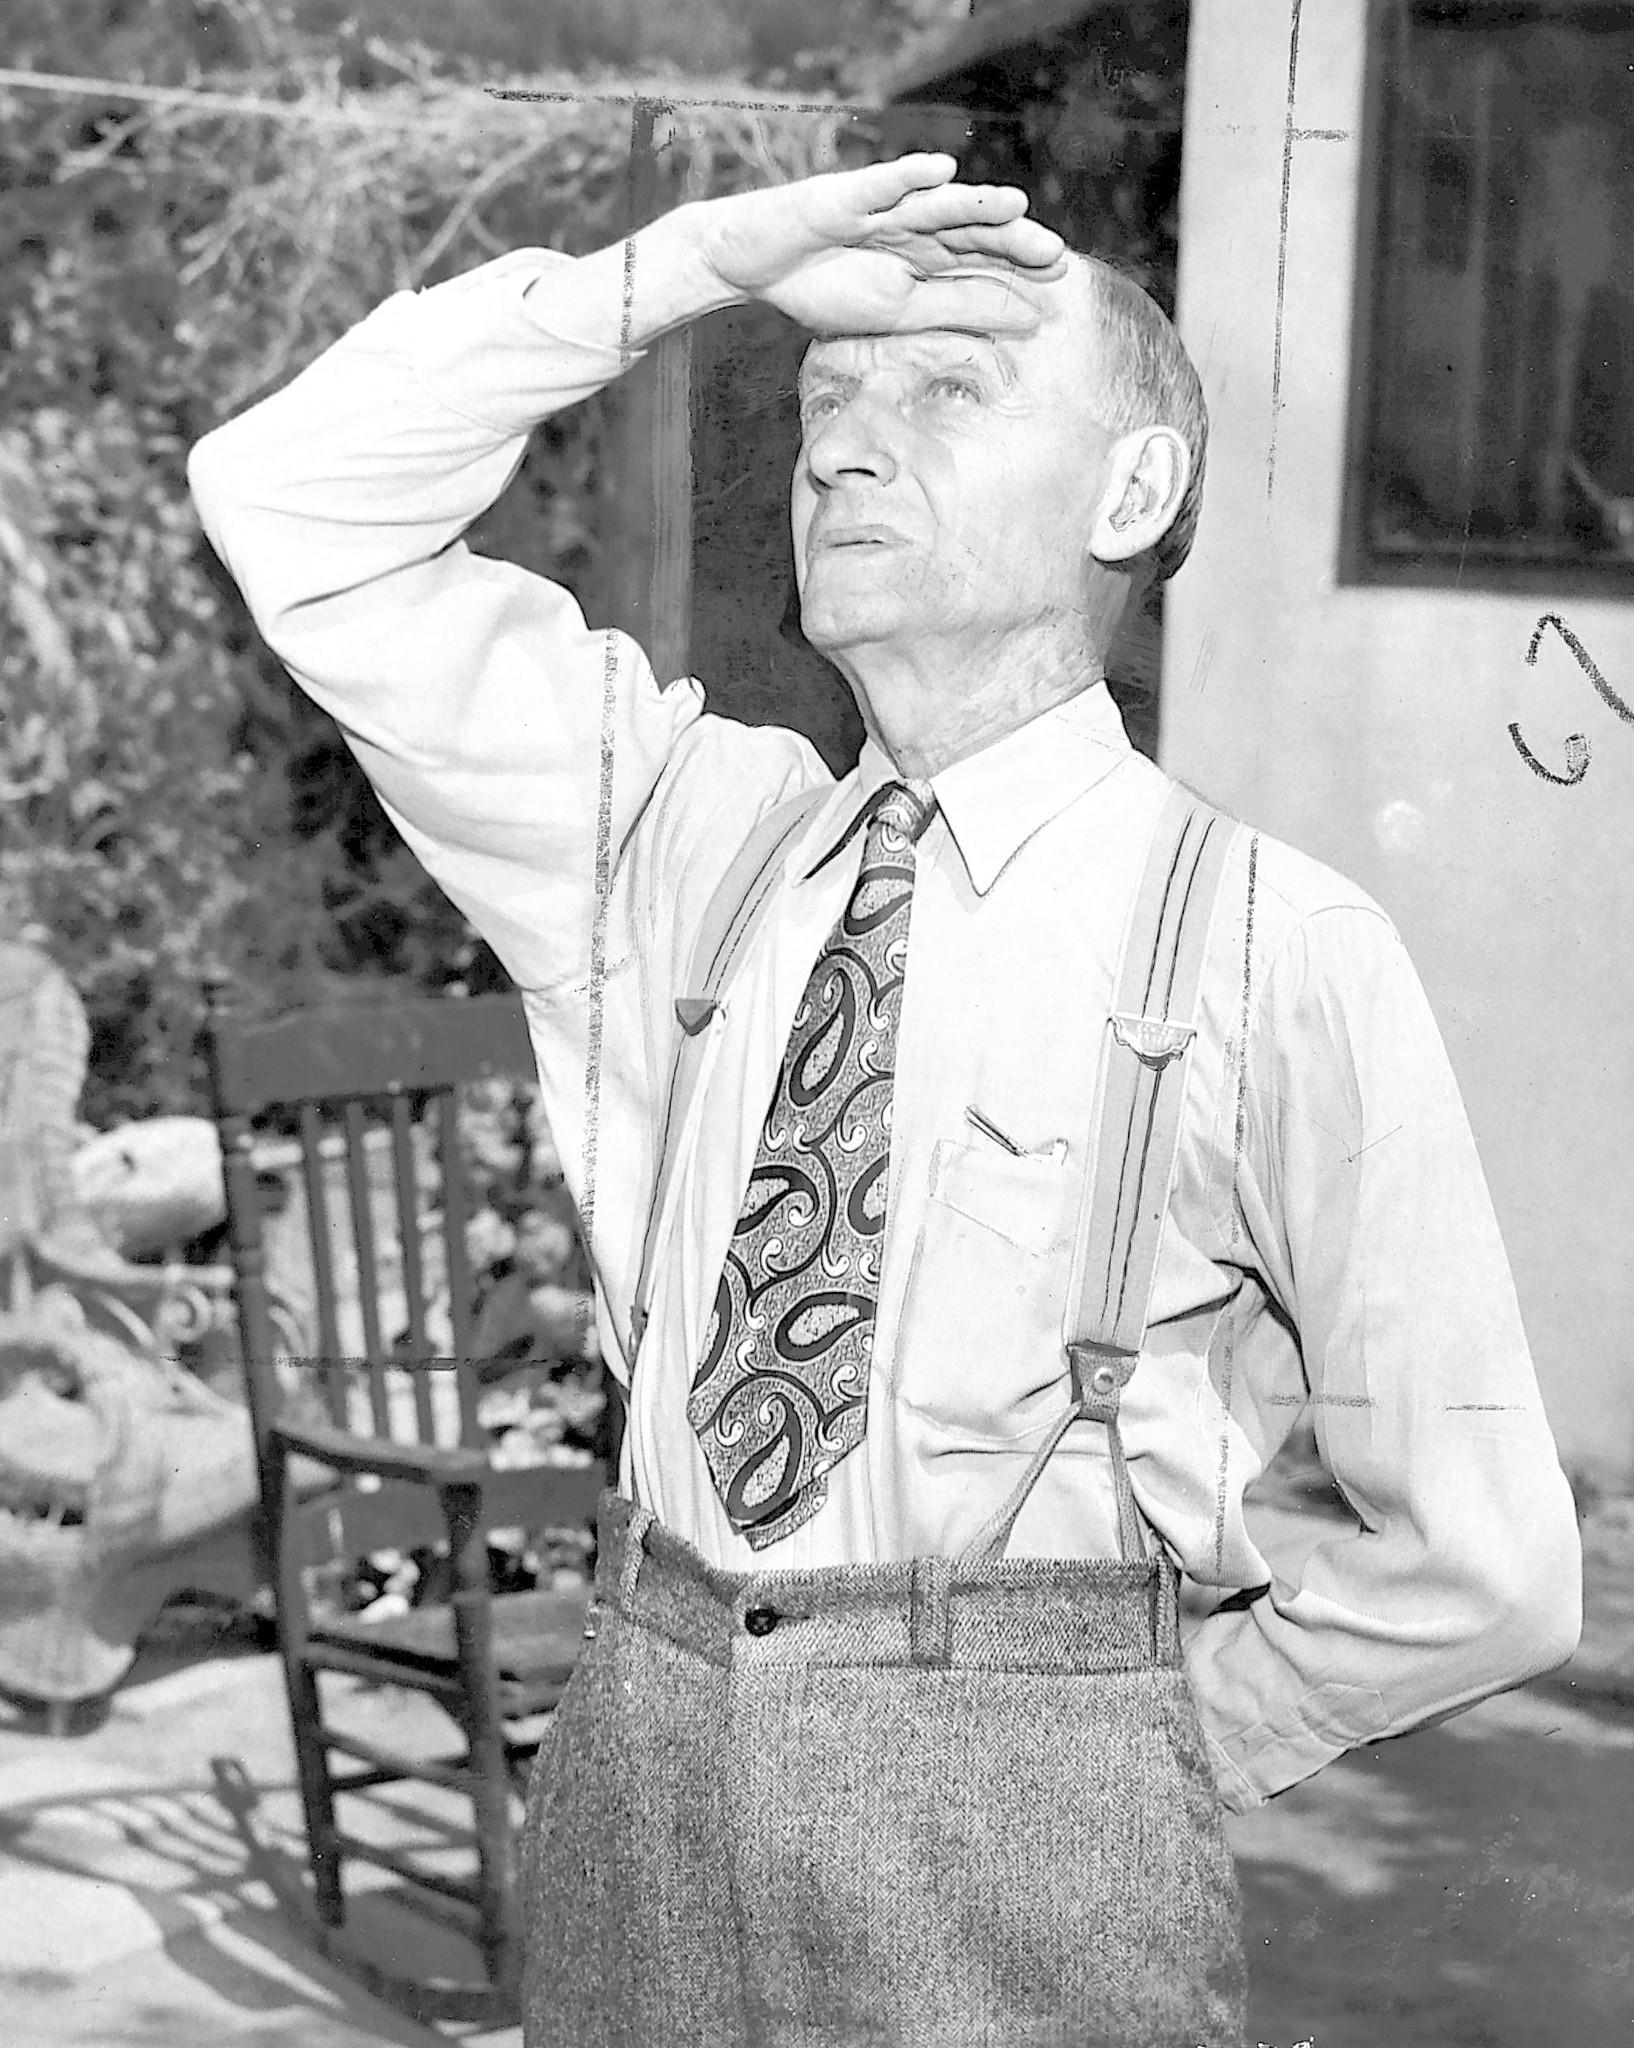 Charles Hatfield Rainmaker Scripps Miramar Ranch